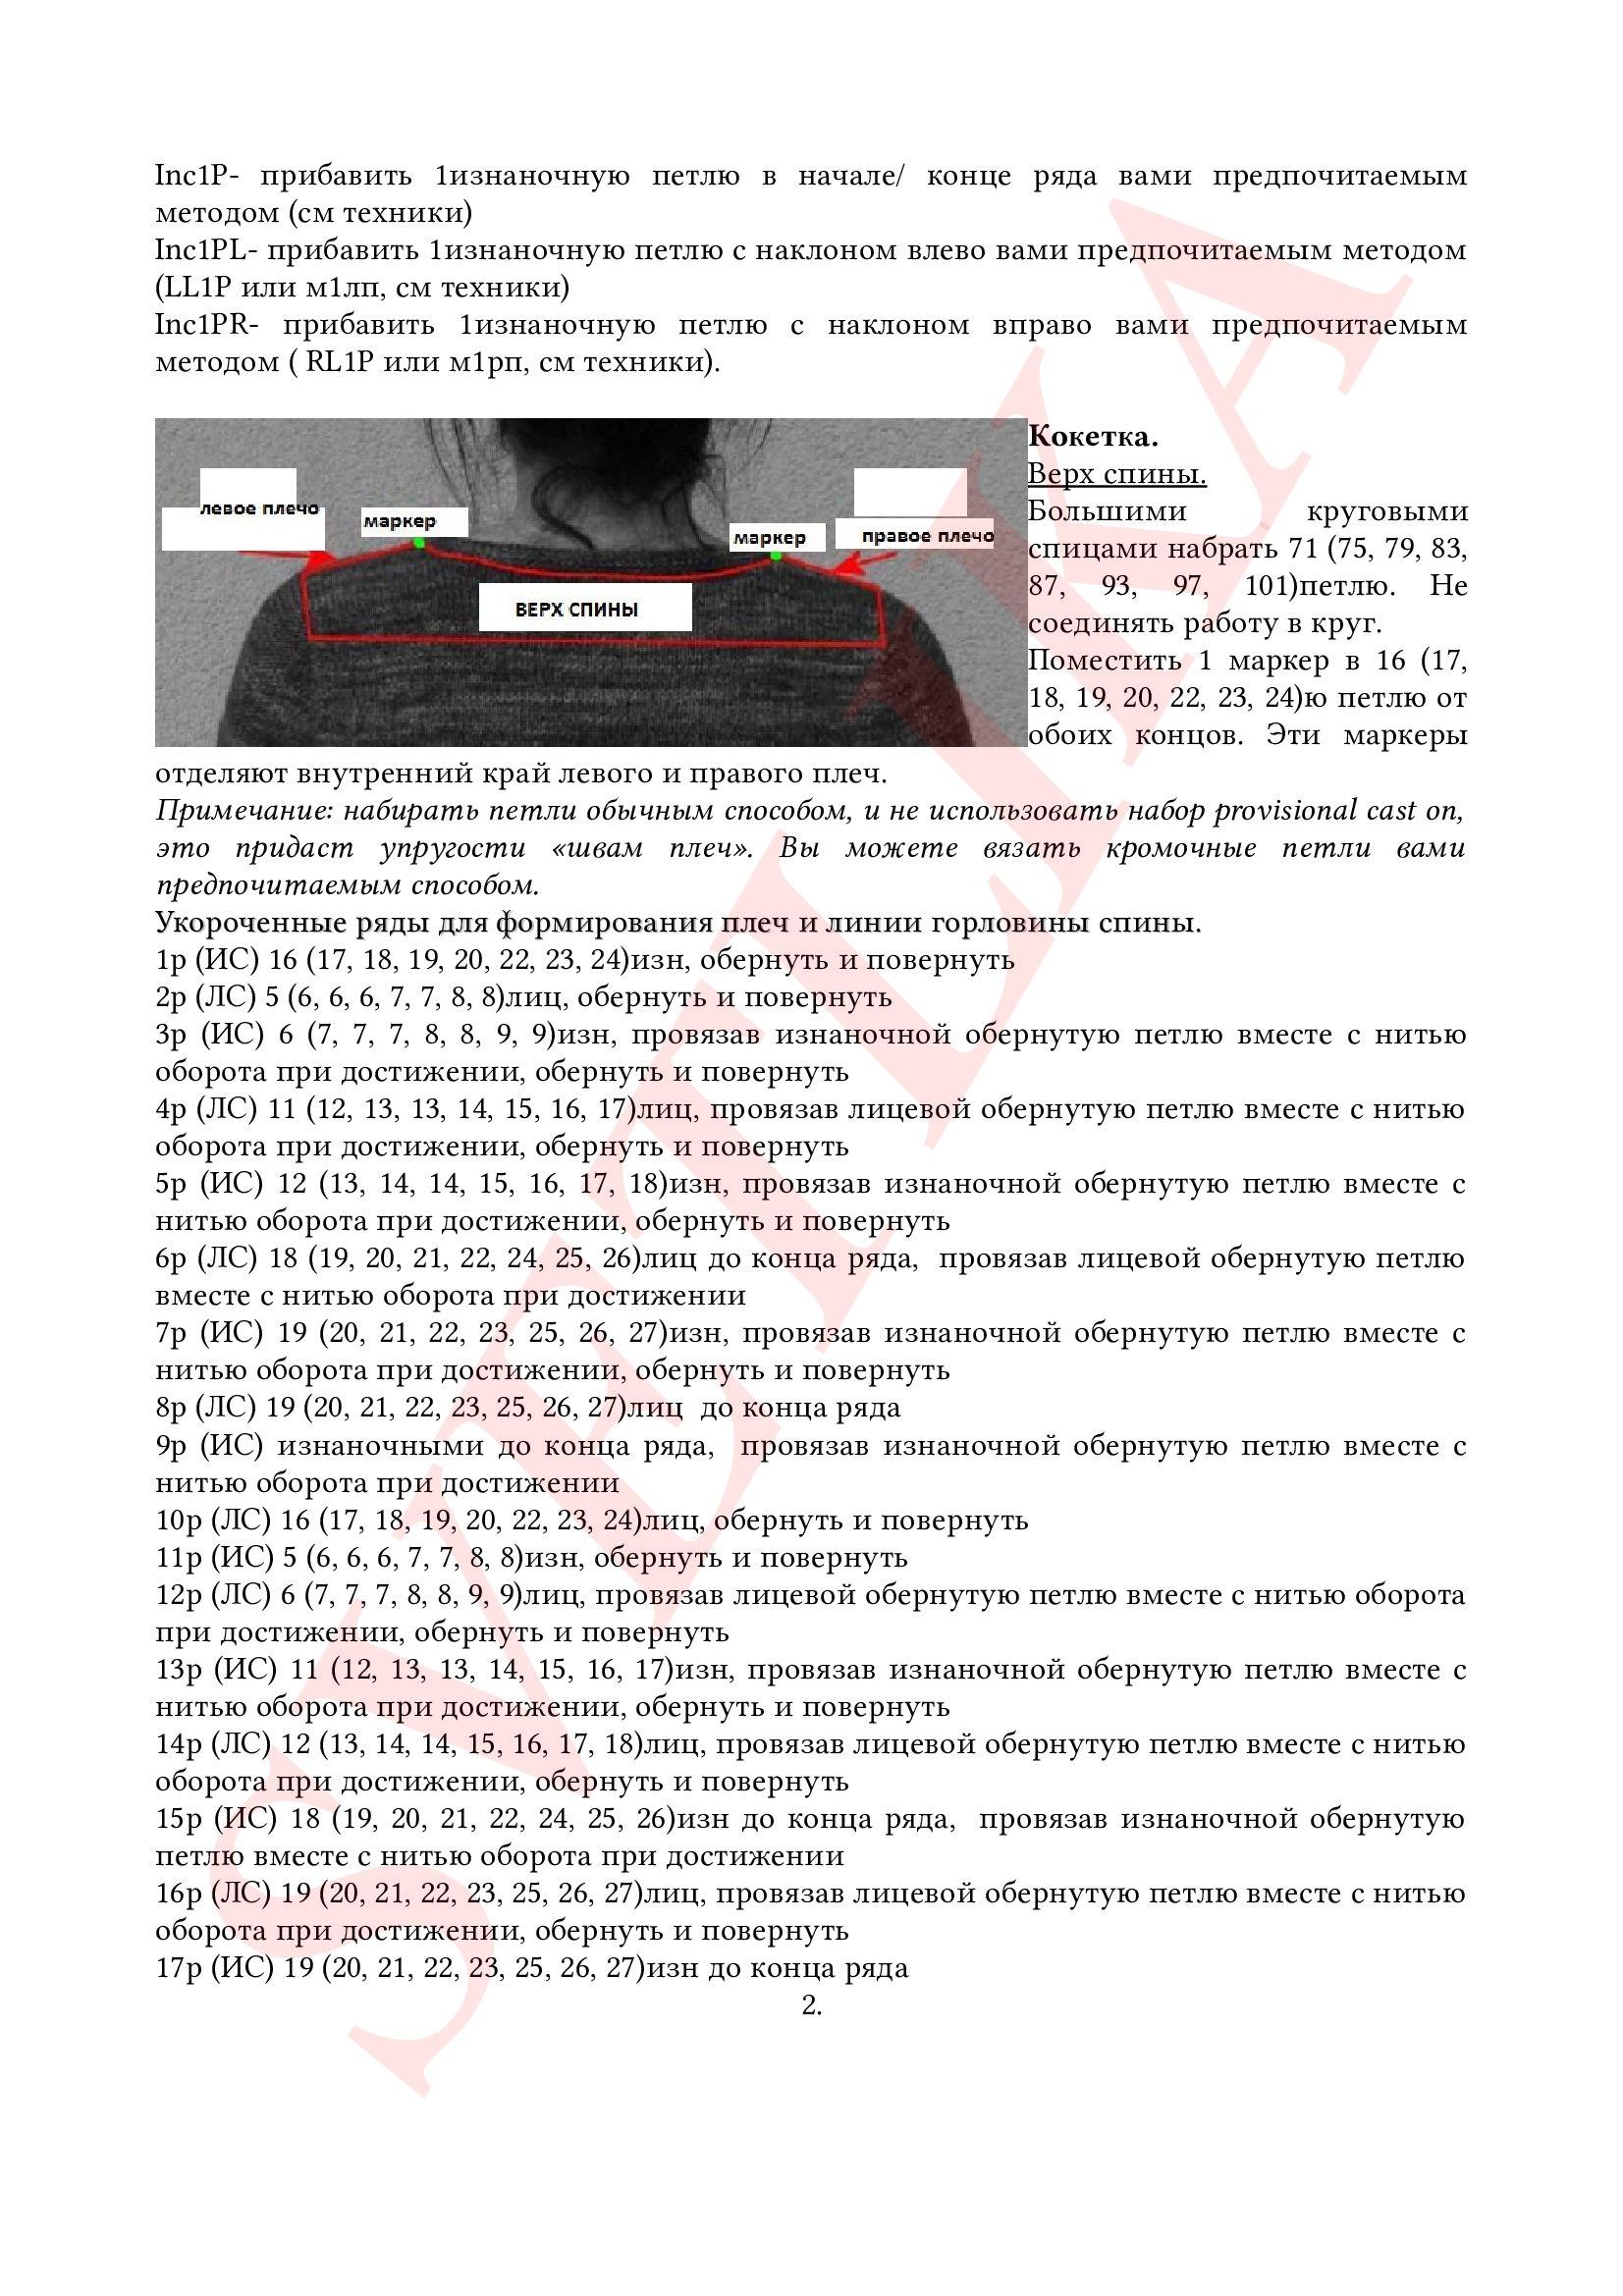 https://img-fotki.yandex.ru/get/177849/125862467.a6/0_1ba548_5b2b48ba_orig